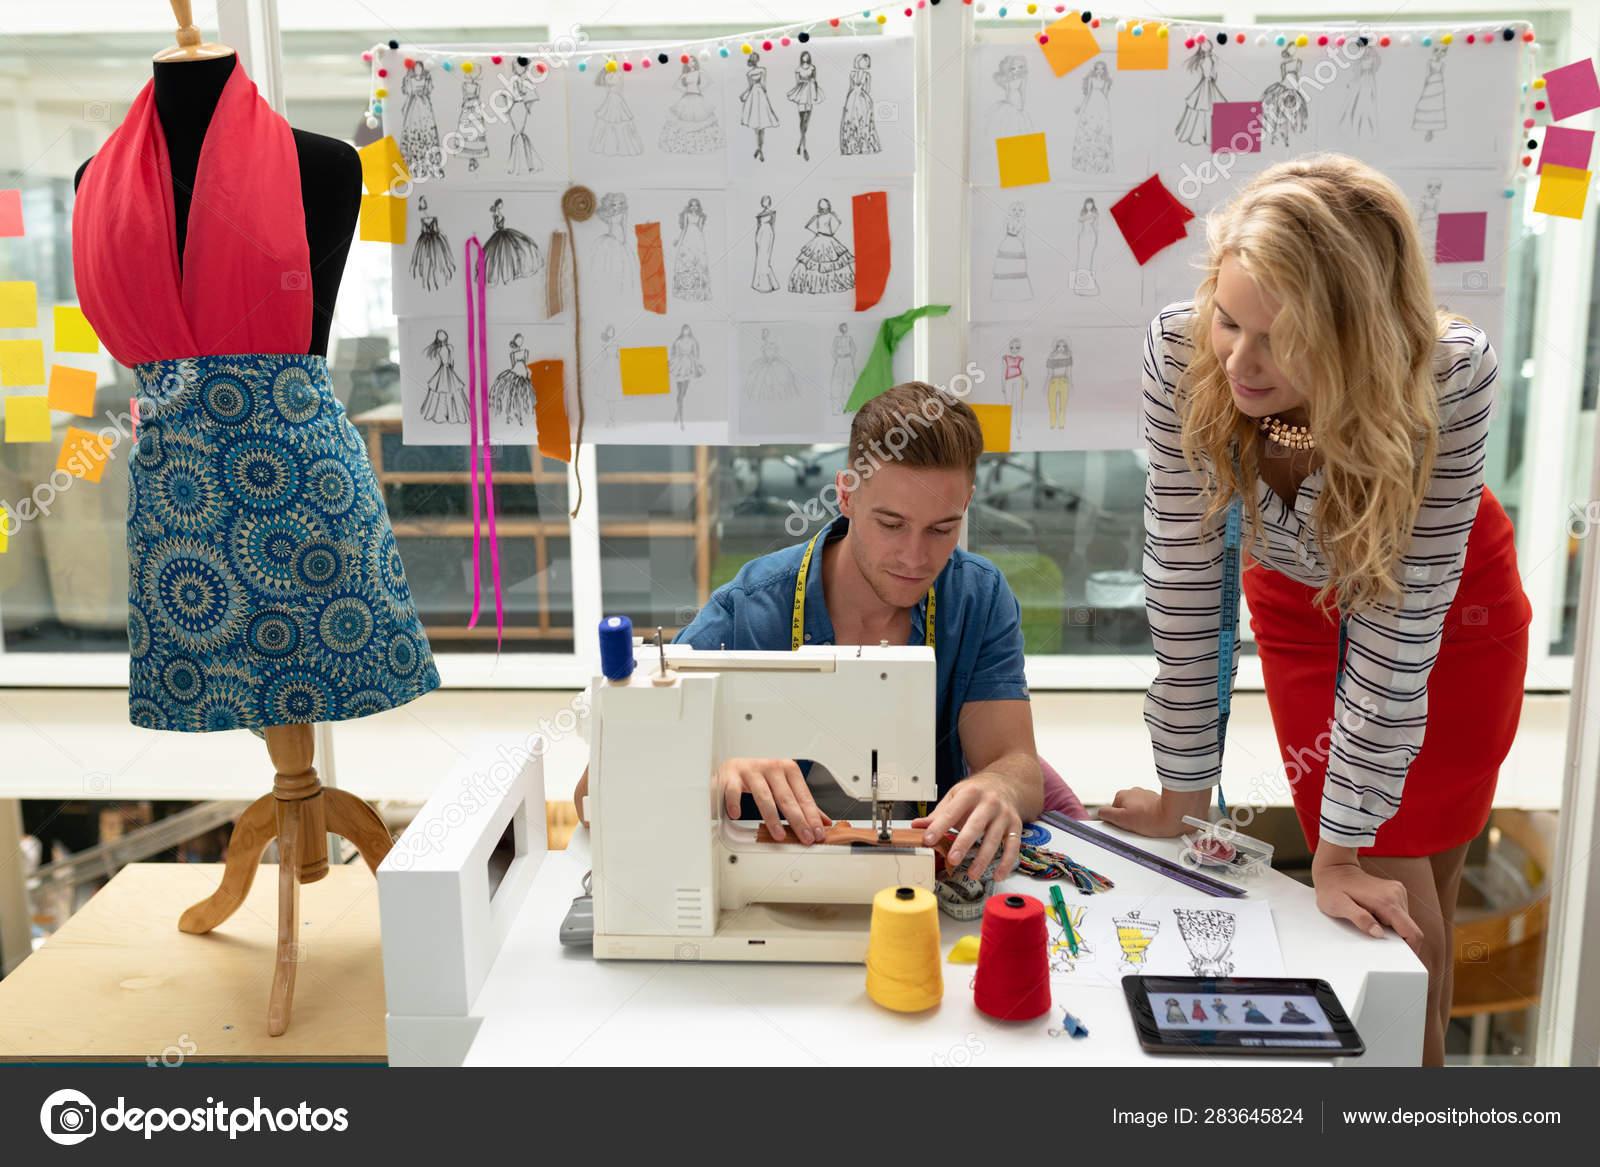 Front View Caucasian Male Fashion Designer Using Sewing Machine Table Stock Photo C Wavebreakmedia 283645824